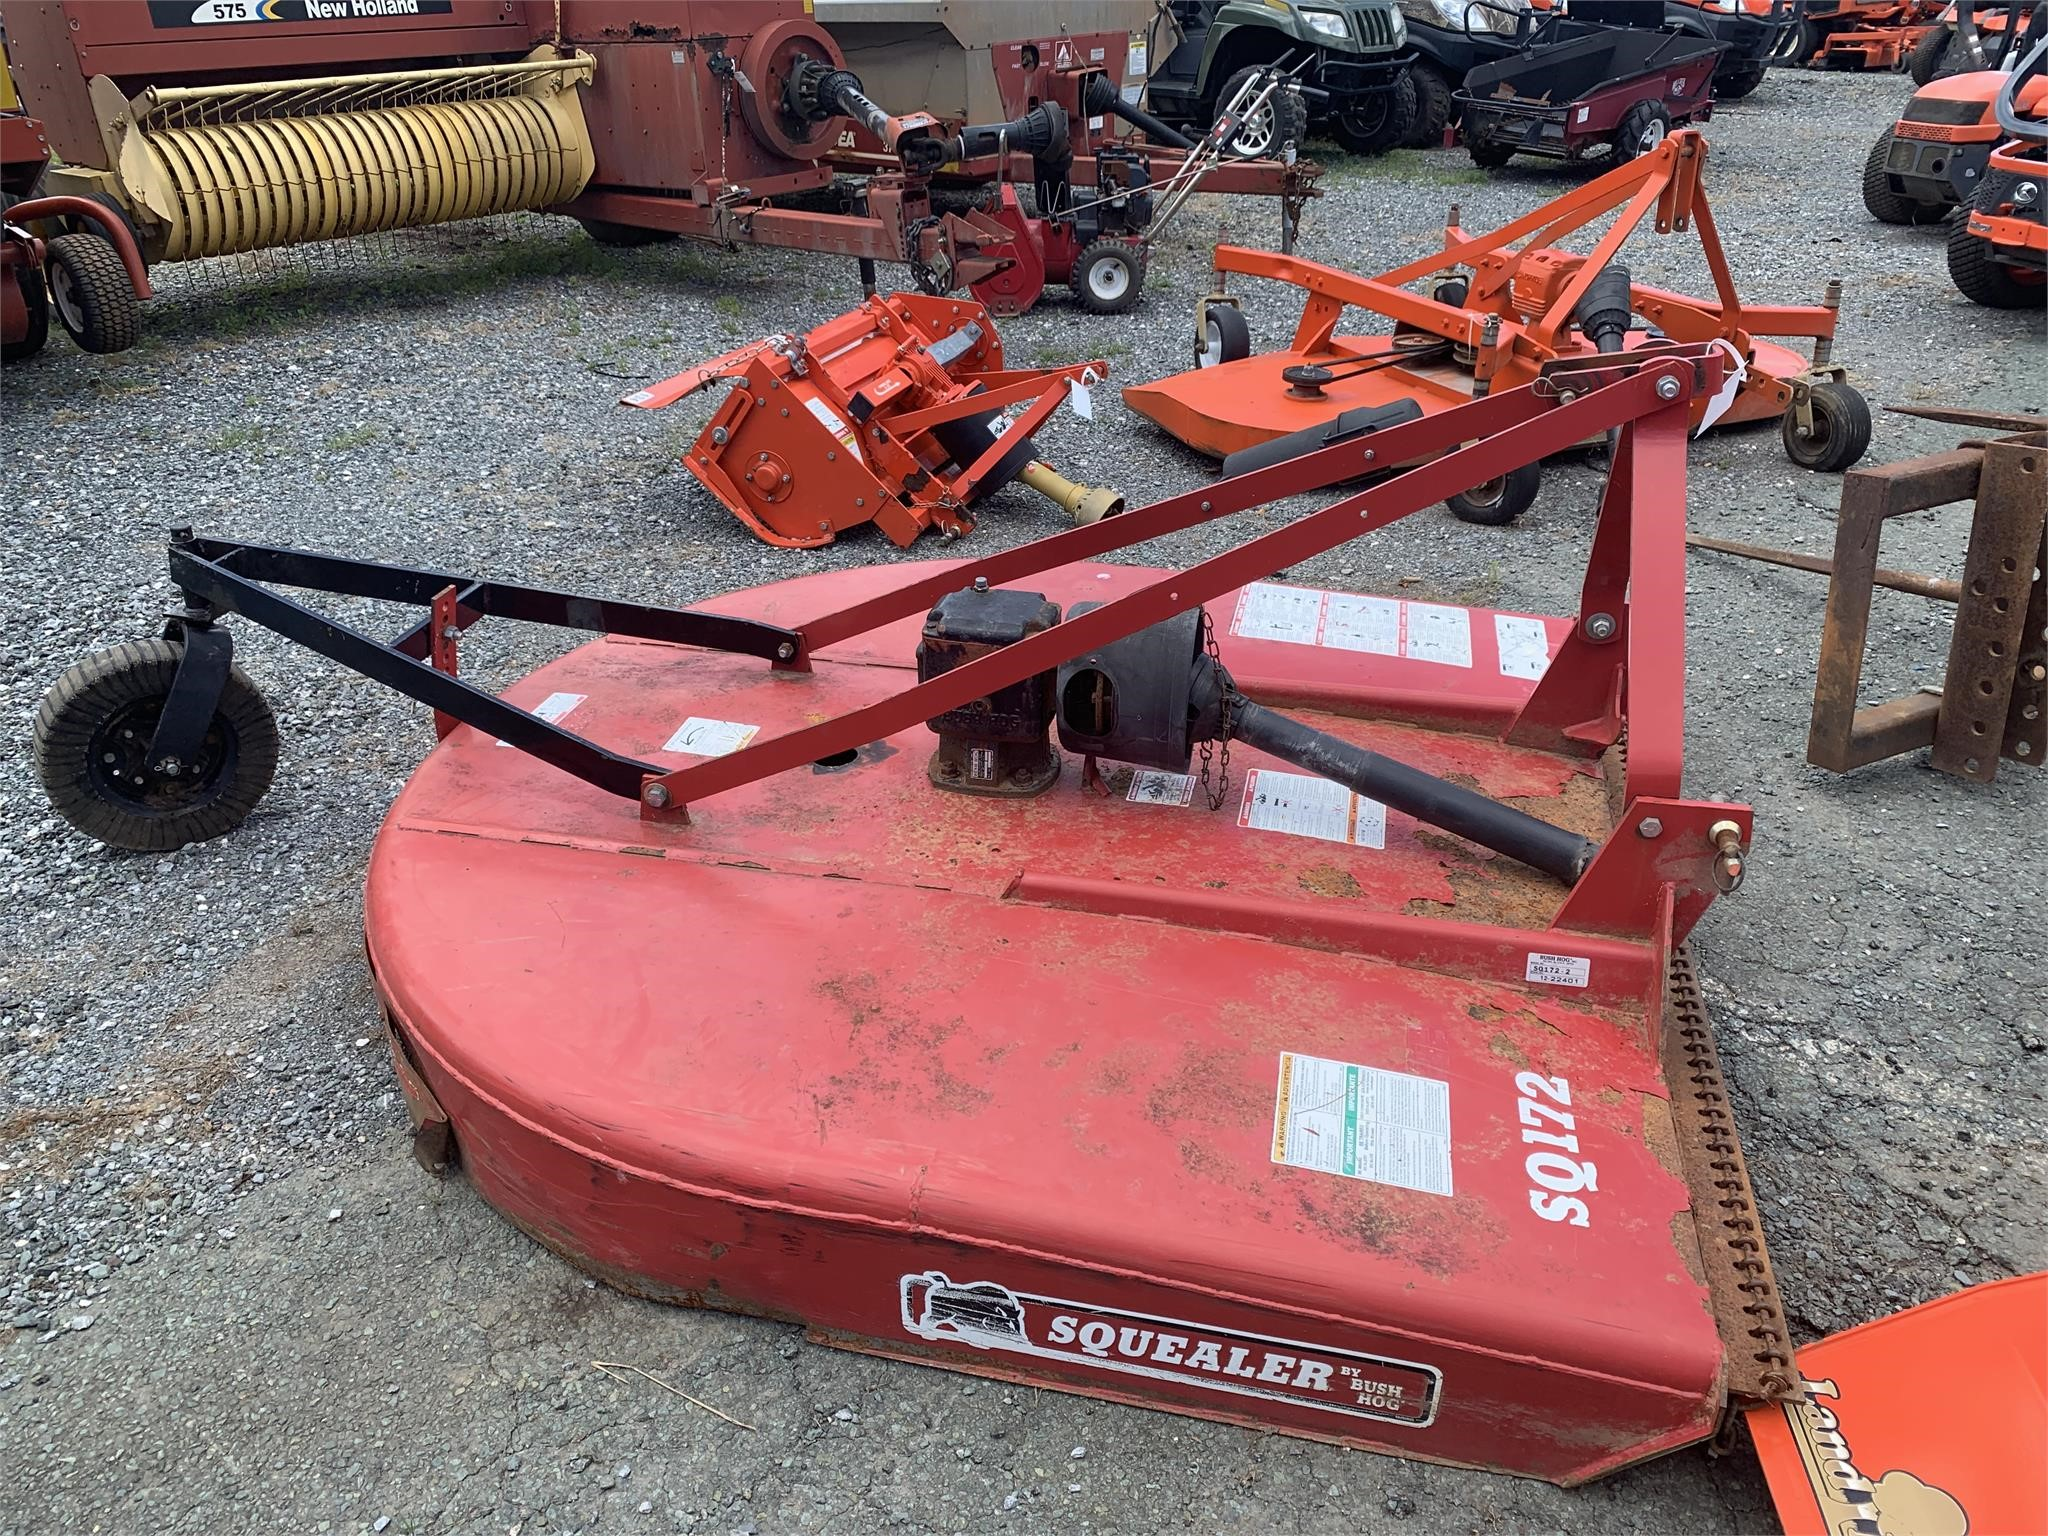 BUSH HOG SQ172 For Sale in Orange, Virginia